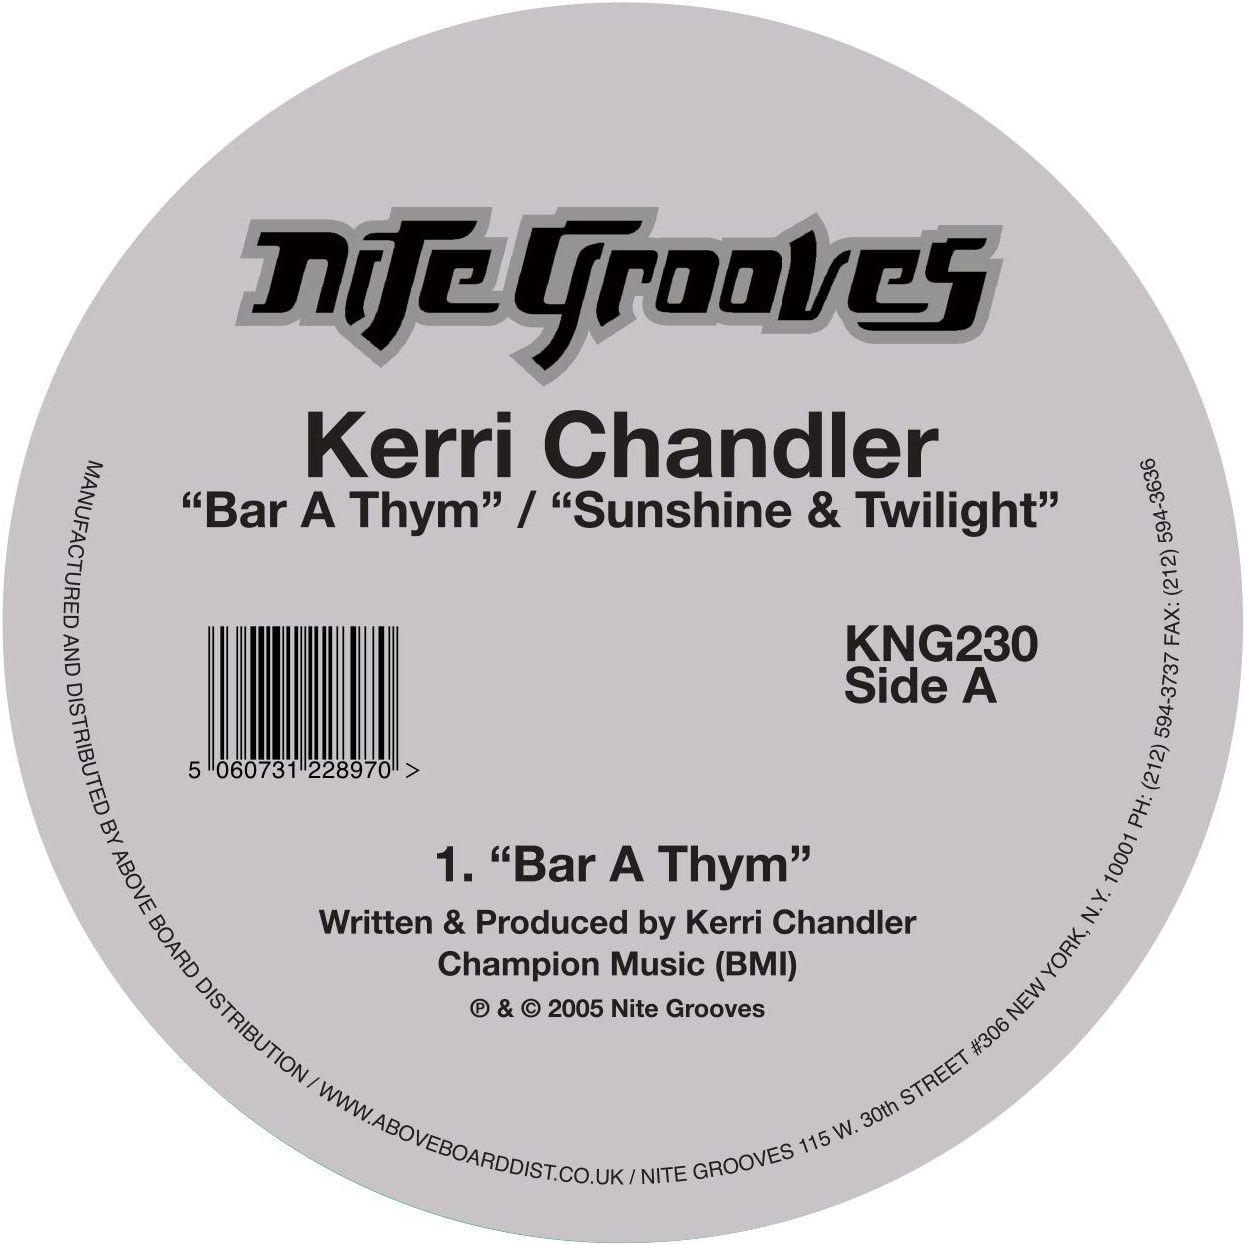 Kerri Chandler - Bar A Thym / Sunshine & Twilight